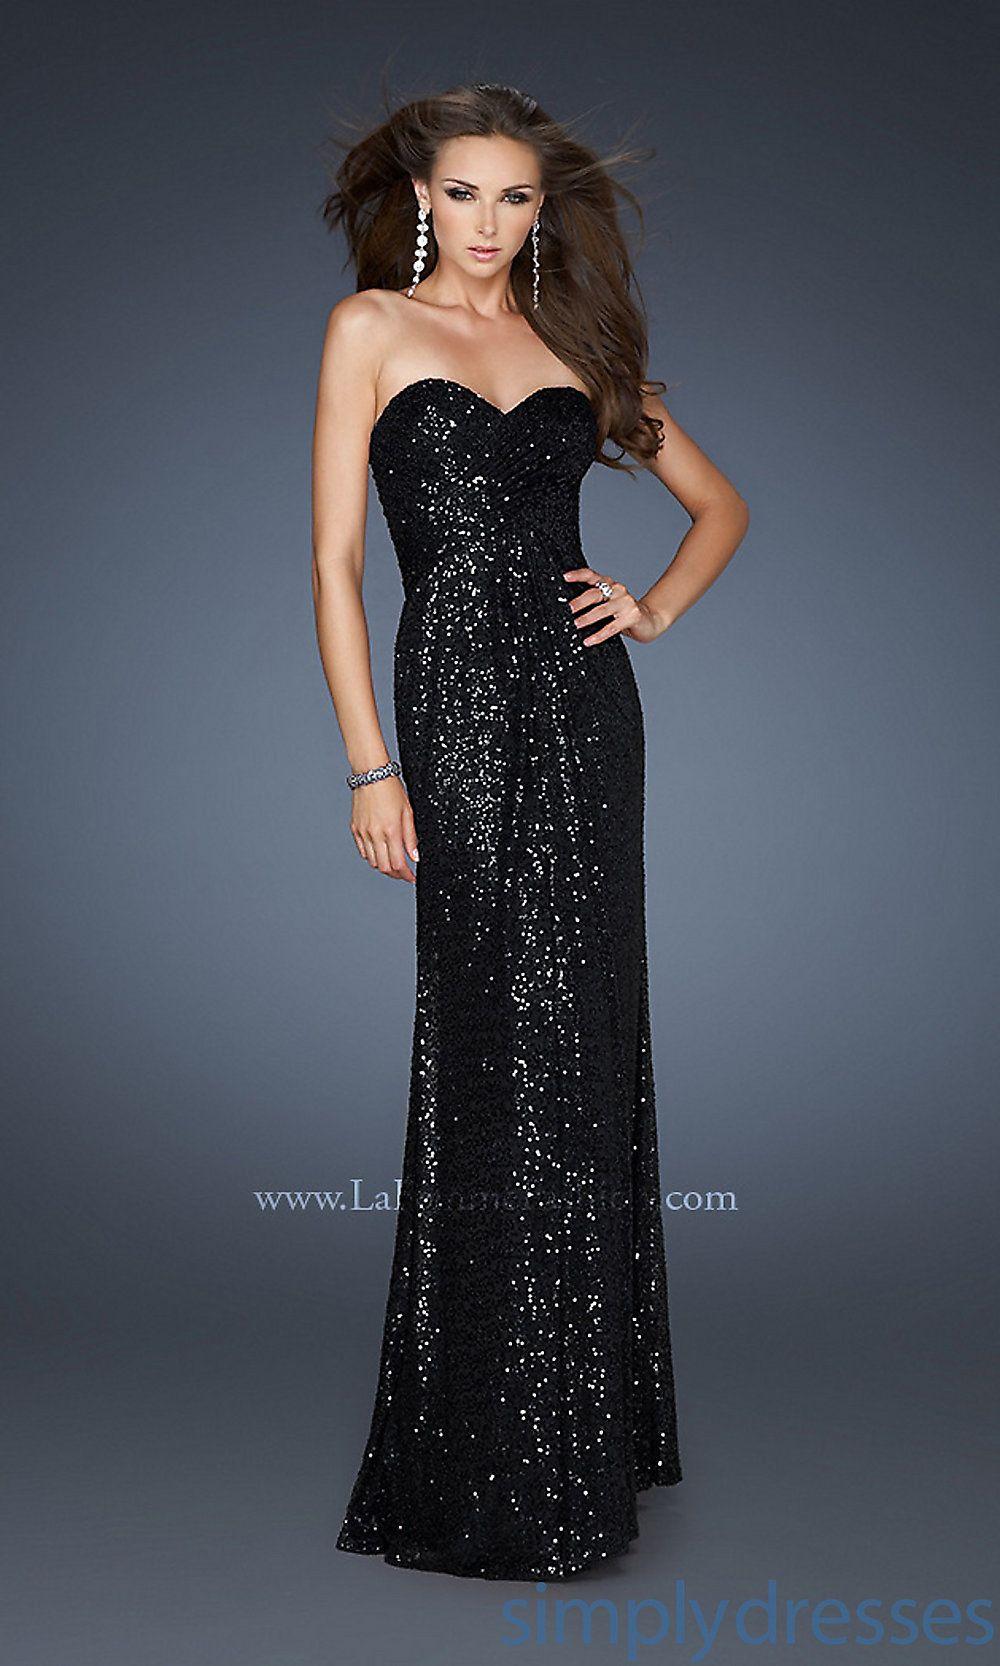 ae328e67d945 Dress, Floor Length Sequin Covered Strapless Dress - Simply Dresses ...